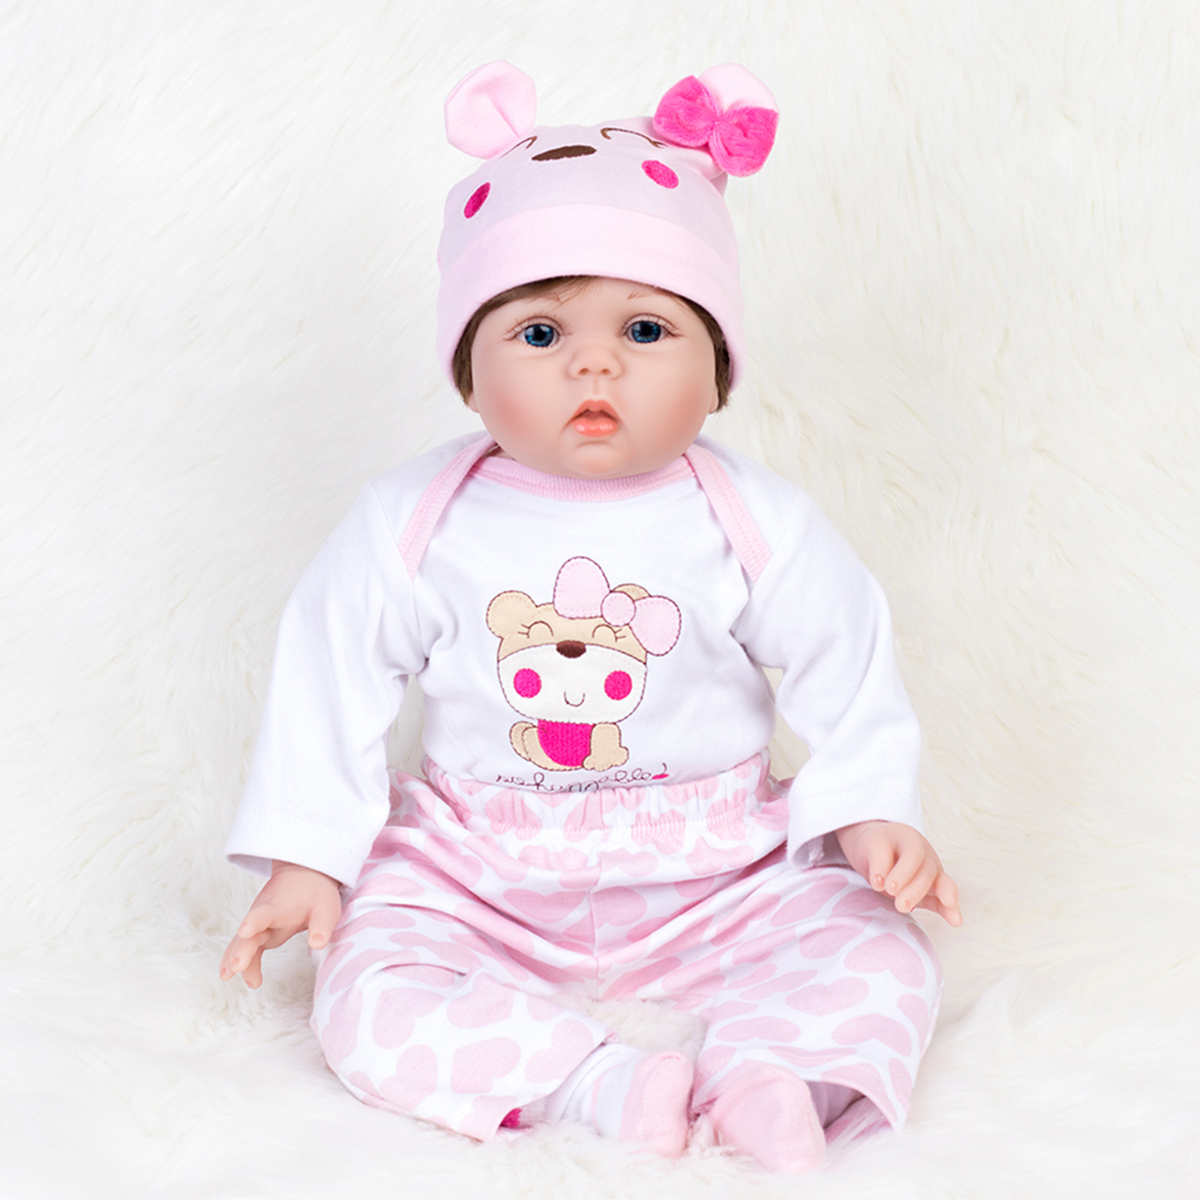 22/'/' Reborn Baby Dolls Lifelike Vinyl Silicone Newborn Girl Handmade Xmas Gift